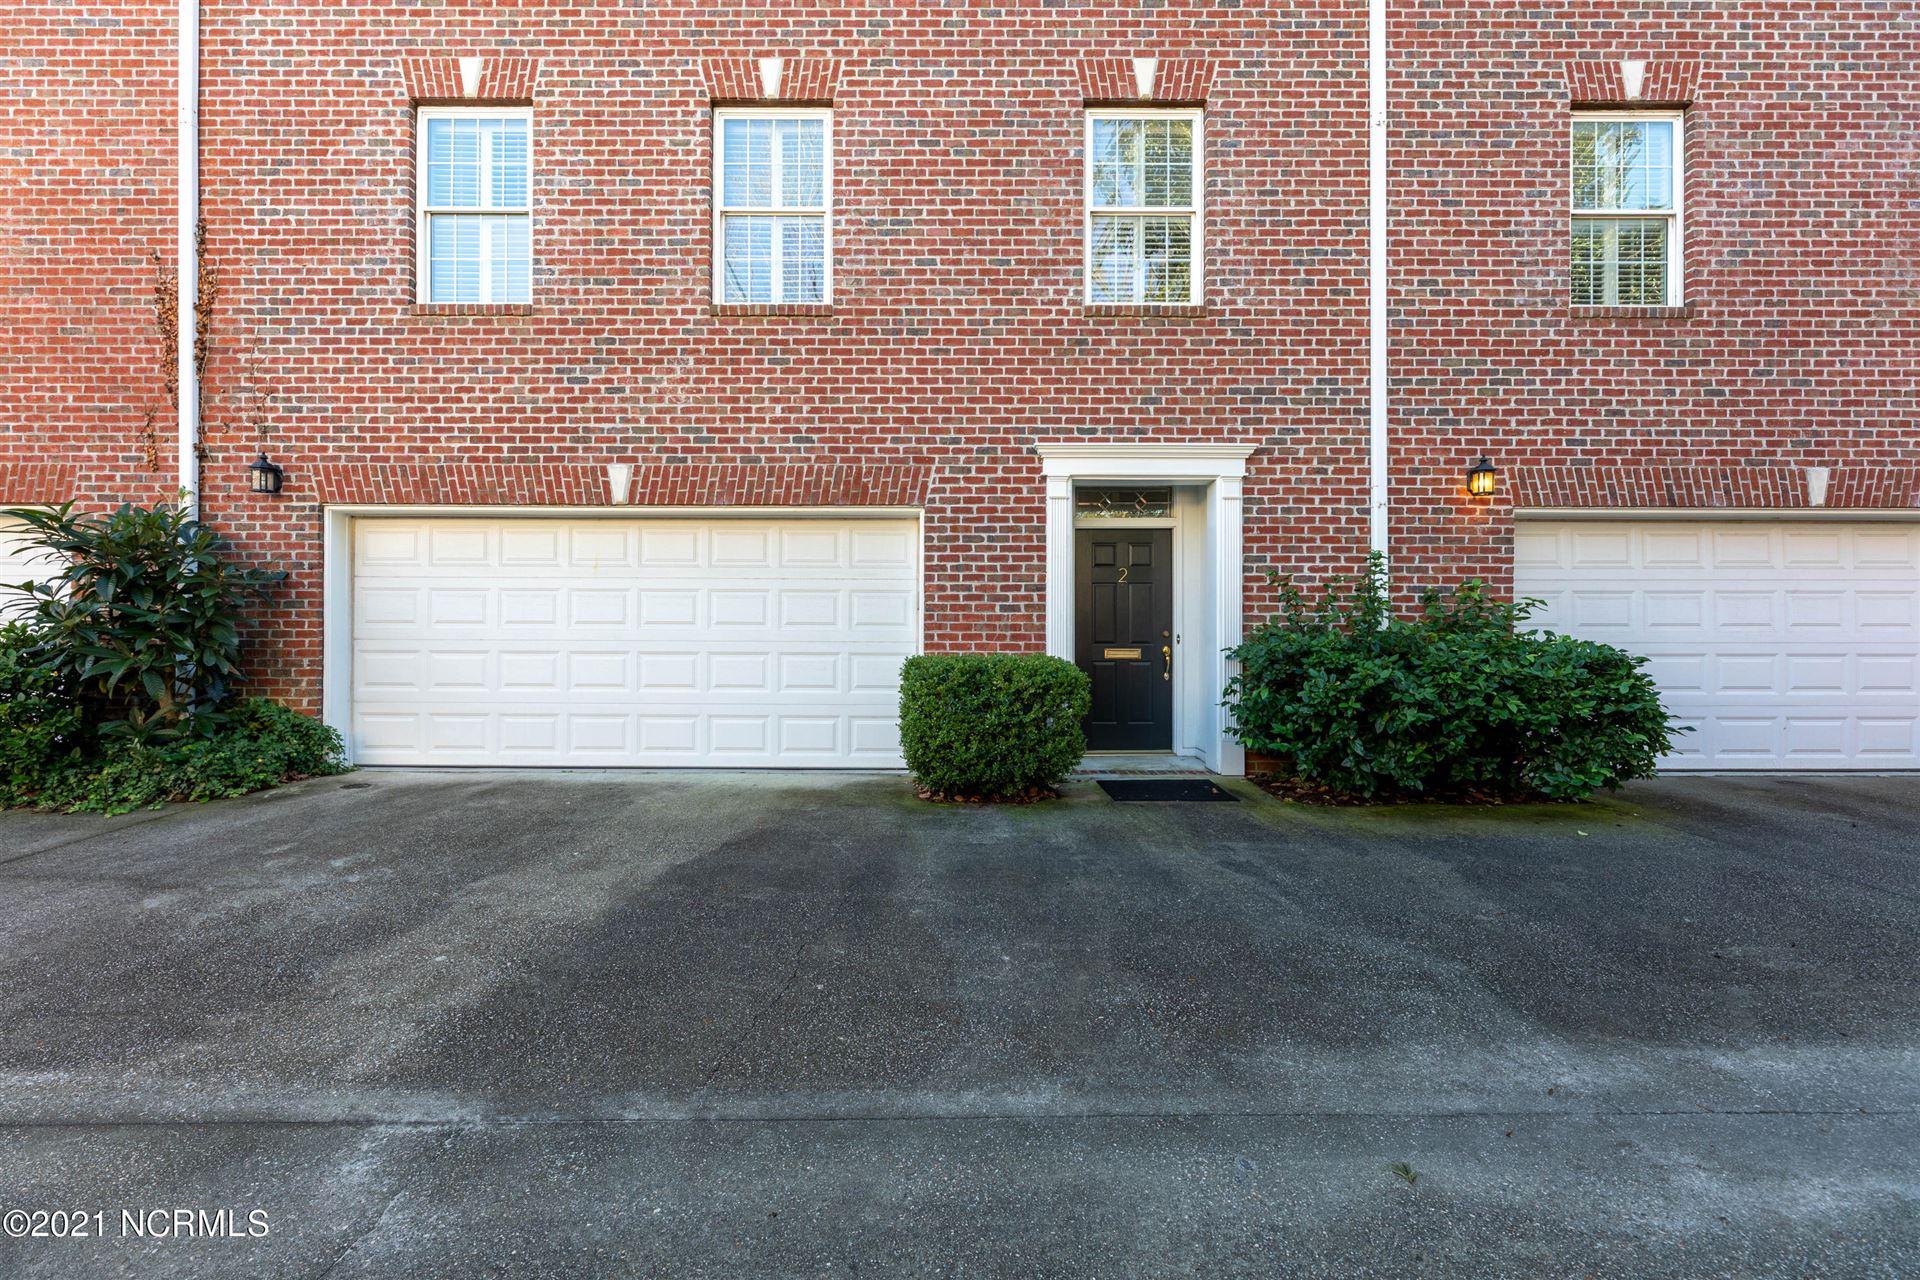 Photo of 622 S 2nd Street #Unit 2, Wilmington, NC 28401 (MLS # 100252387)